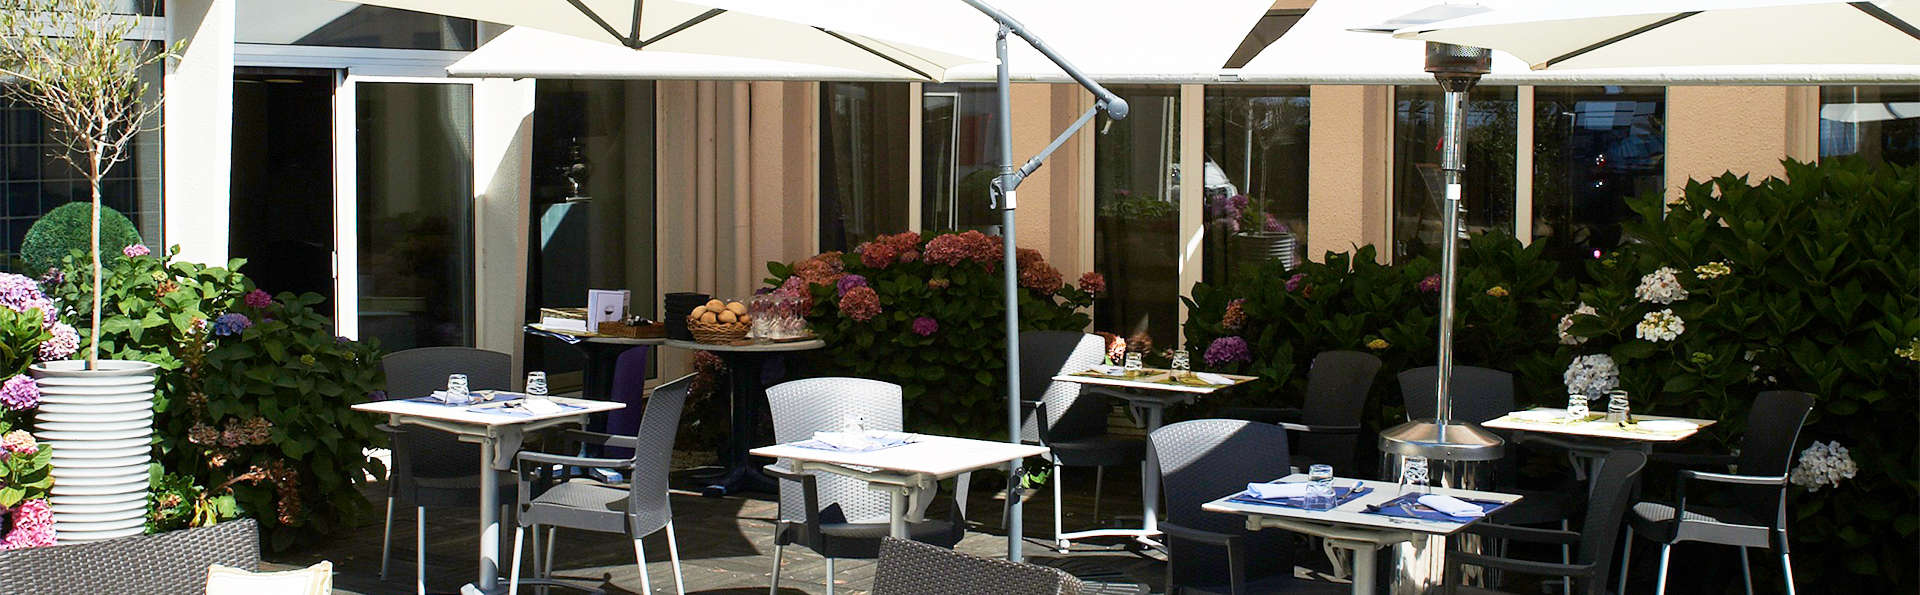 Kastel Wellness Hotel - Thalasso et Spa  - EDIT_ext2.jpg